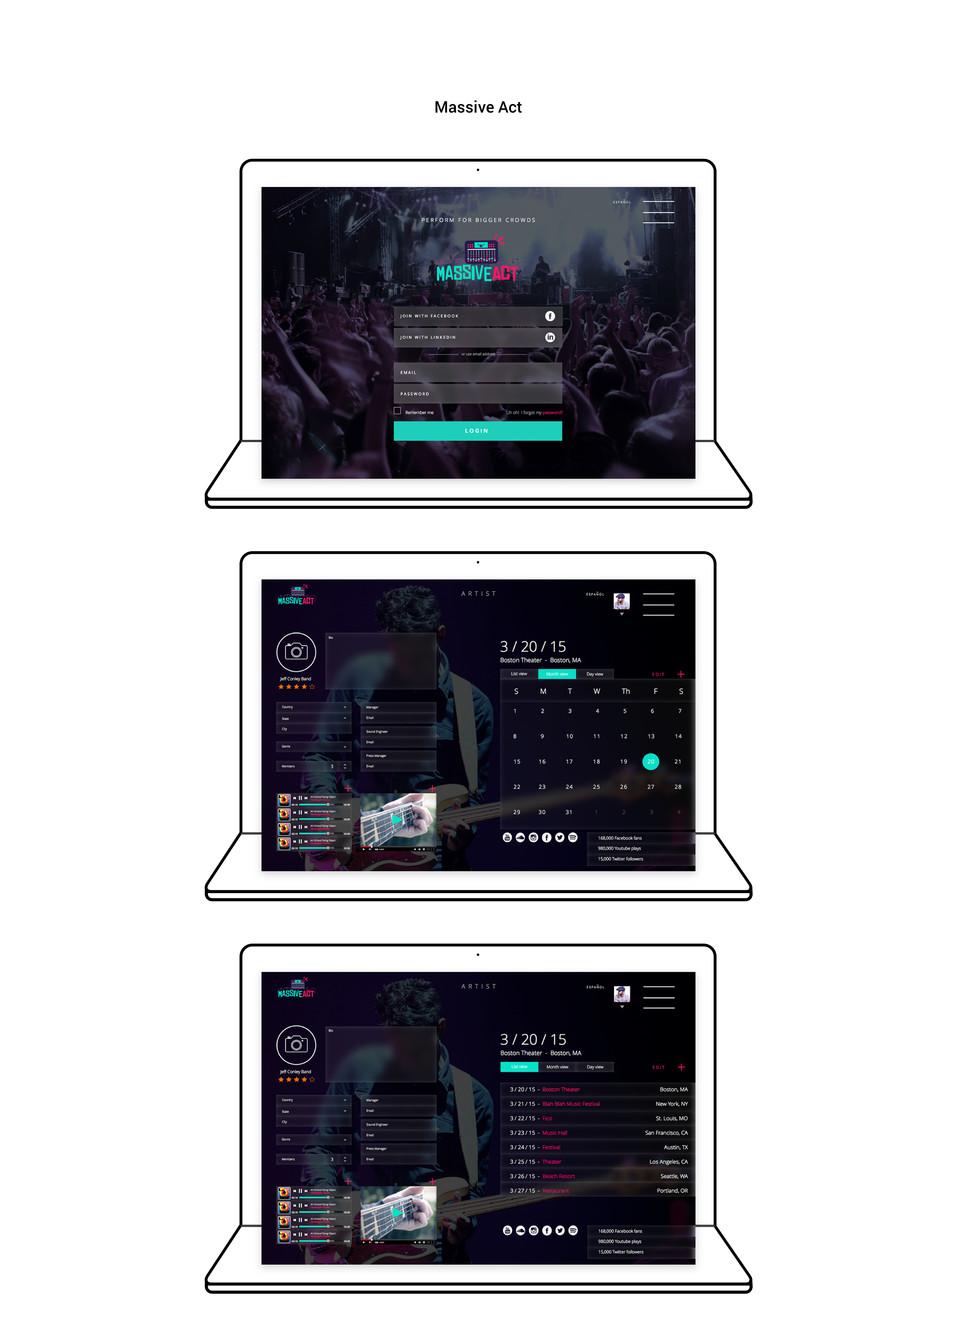 Massive Act Copy.jpg